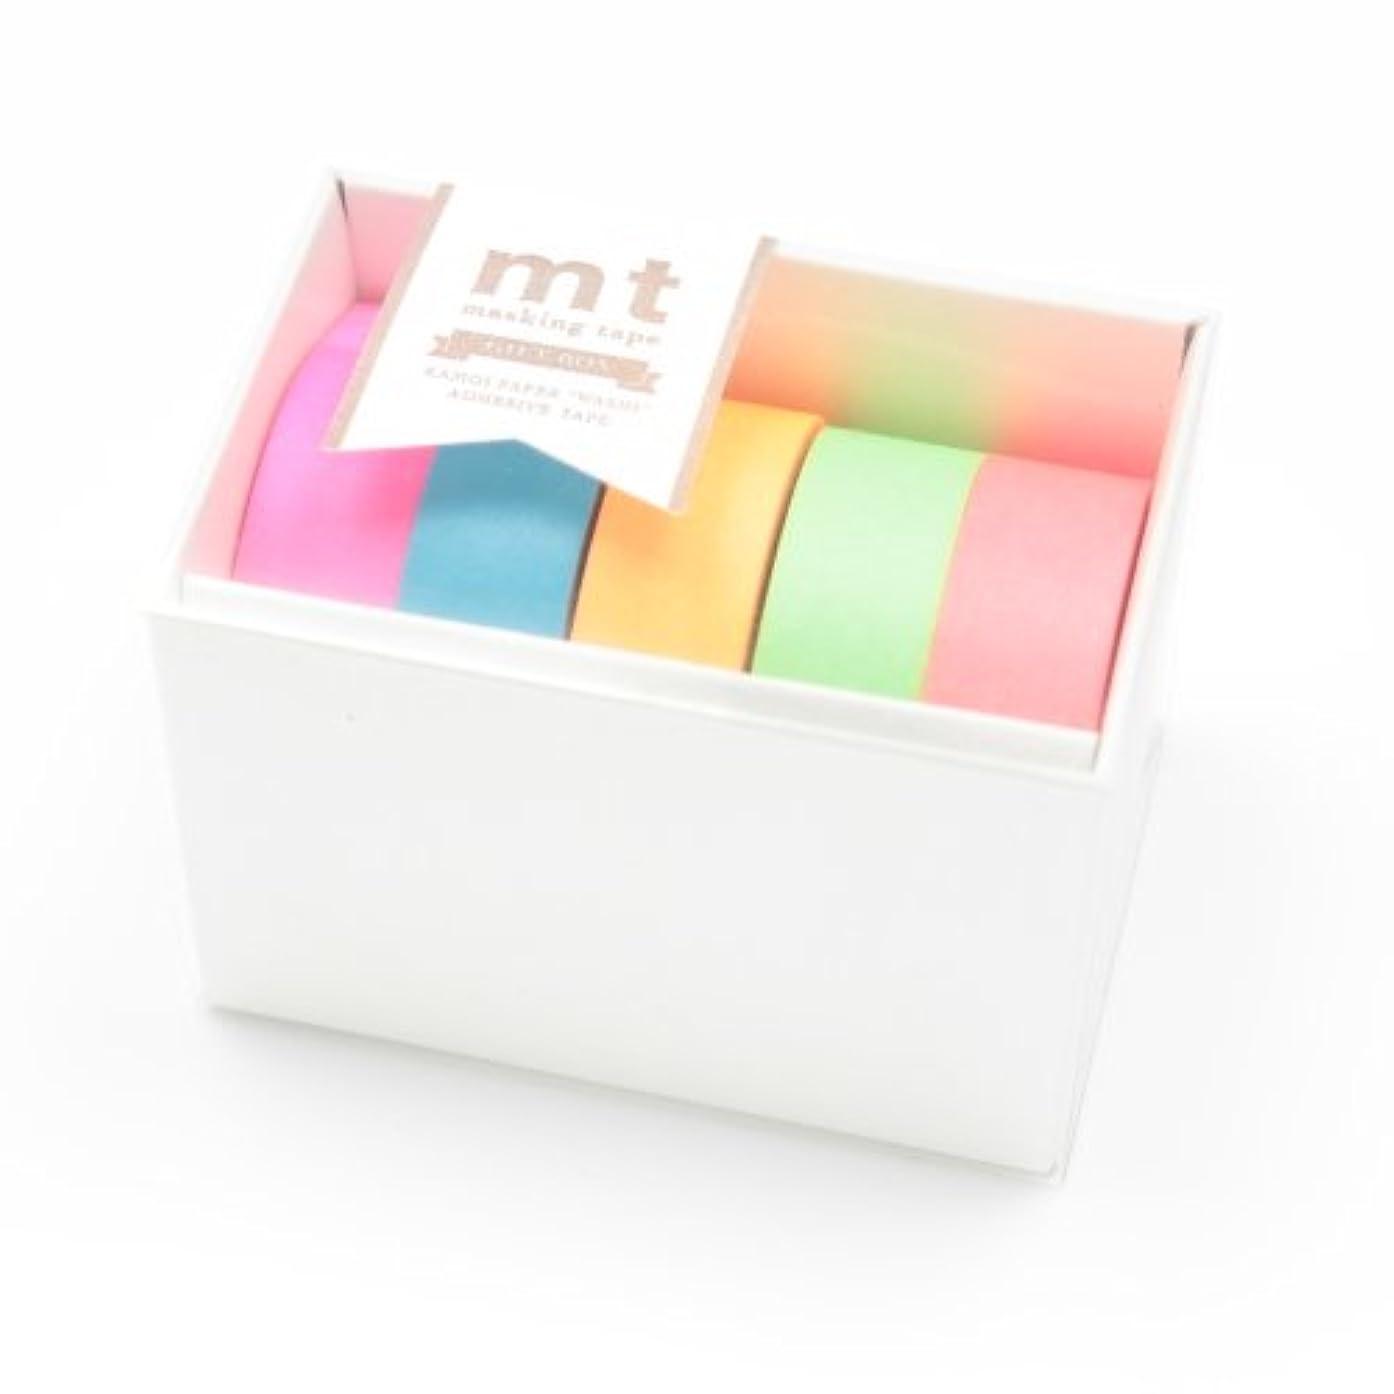 MT Kamoi Kakoshi Masking Tape Gift Box Neon, 15mm Width, 10mm Roll in 5 Pieces (MT05G002)